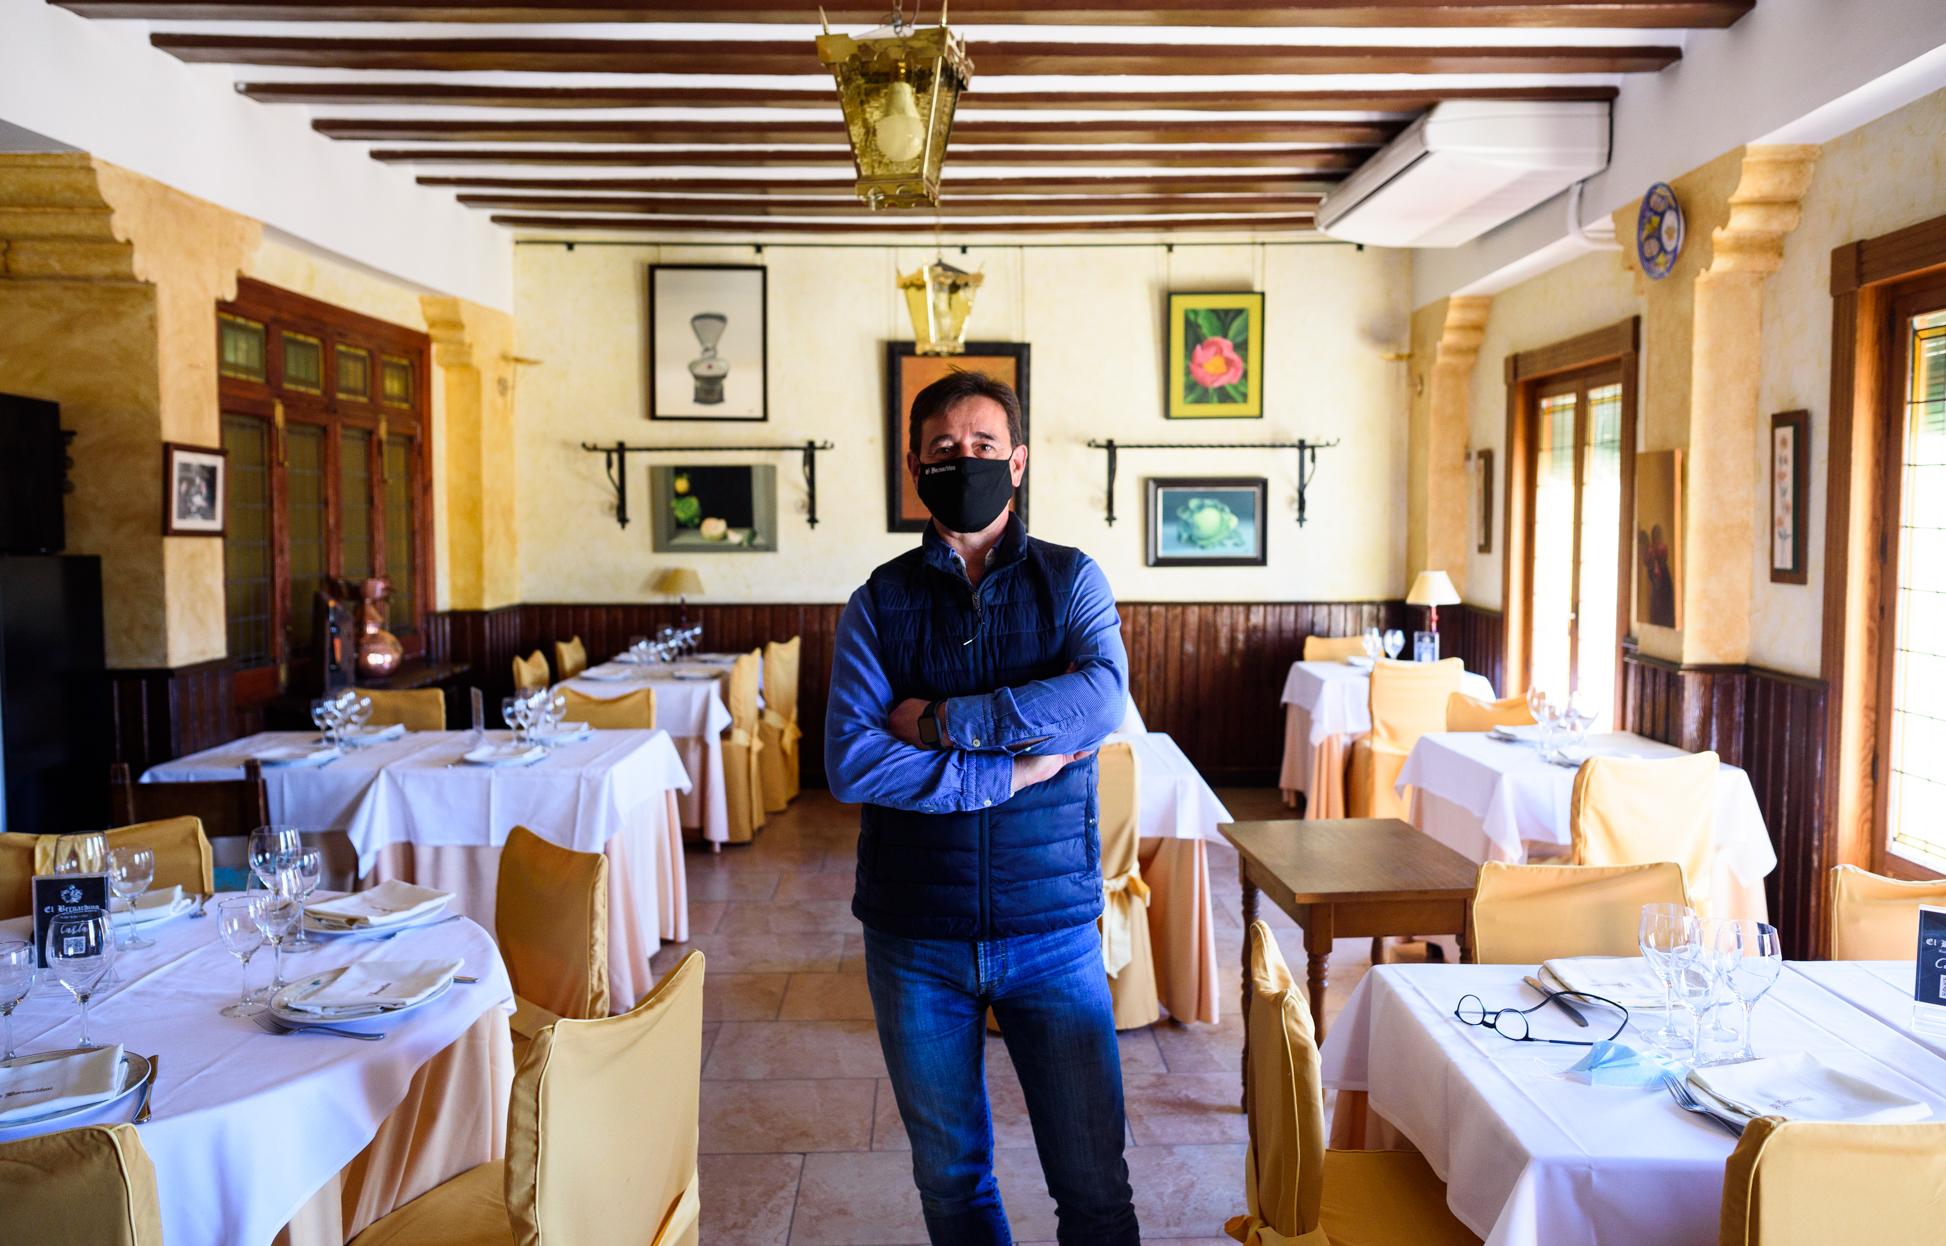 restaurante-el-bernardino-segovia.jpg